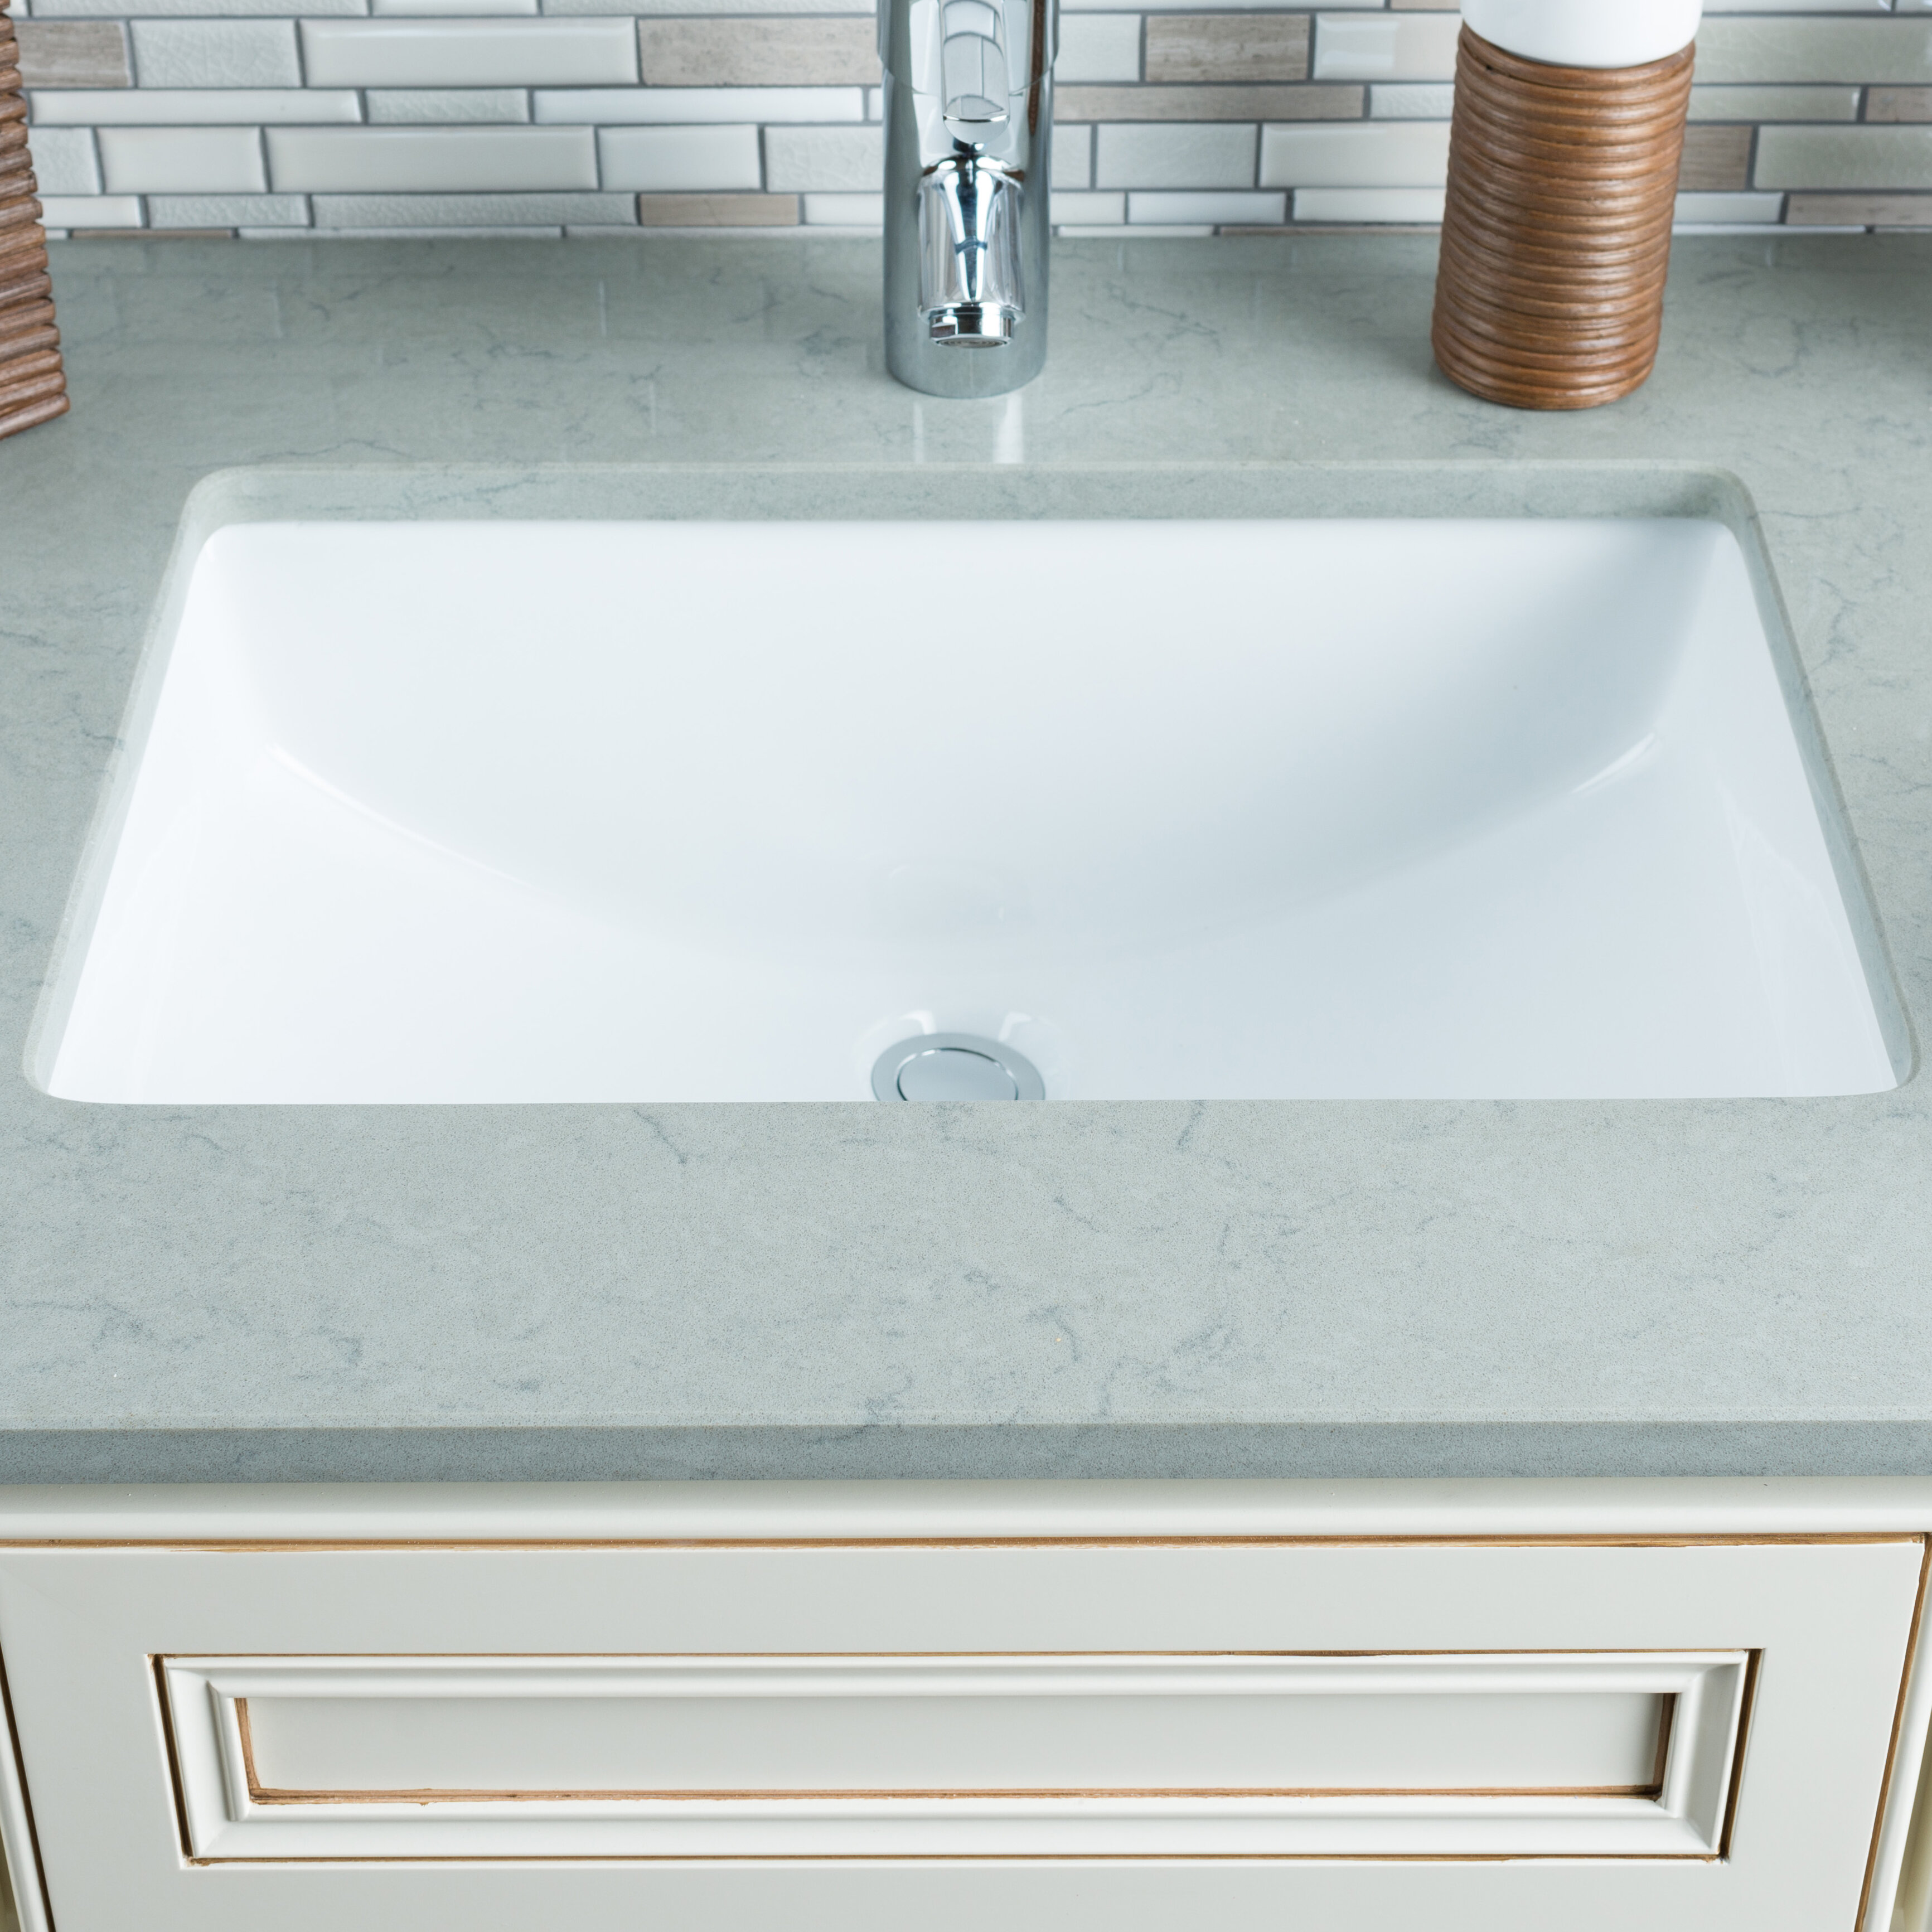 Hahn ceramic rectangular undermount bathroom sink with overflow reviews wayfair